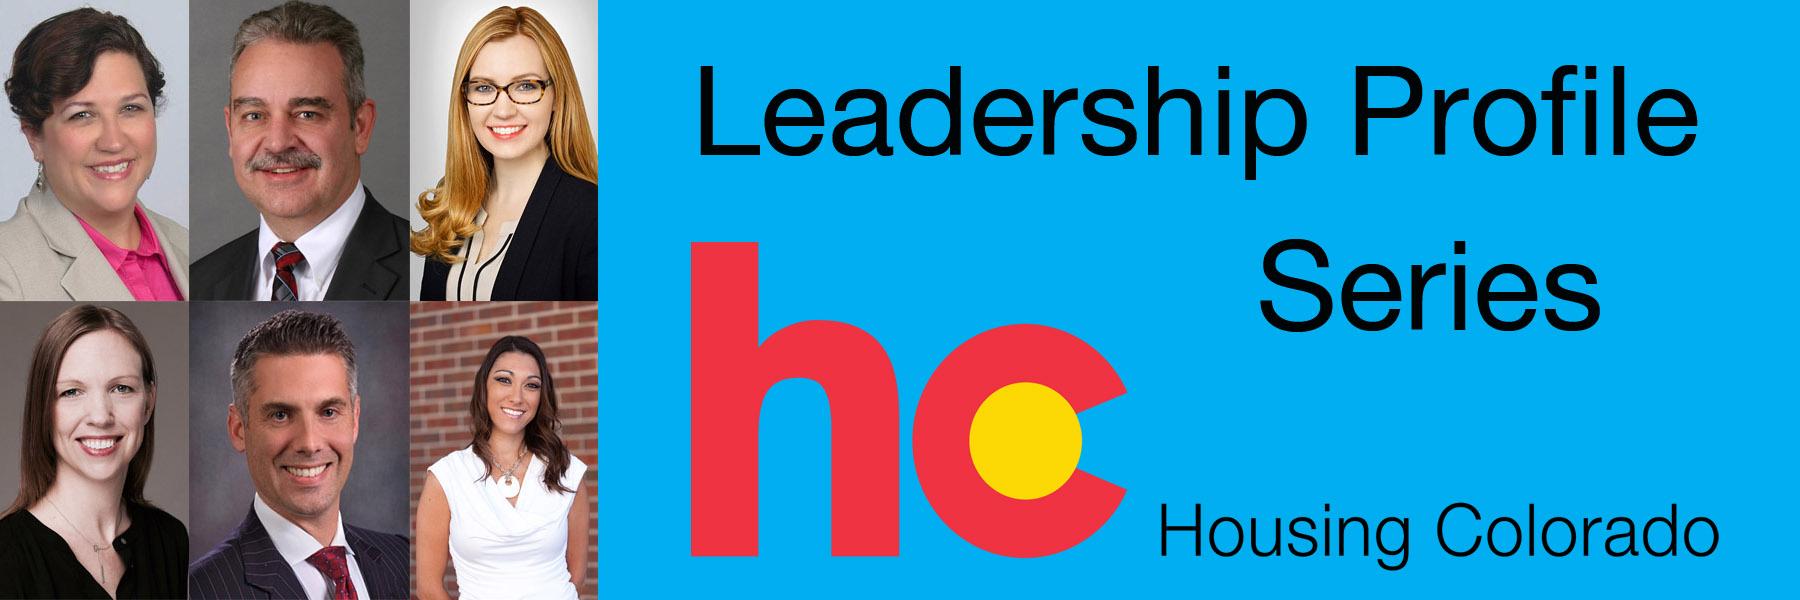 Leadership Profile: Brian Reilly - Housing Colorado